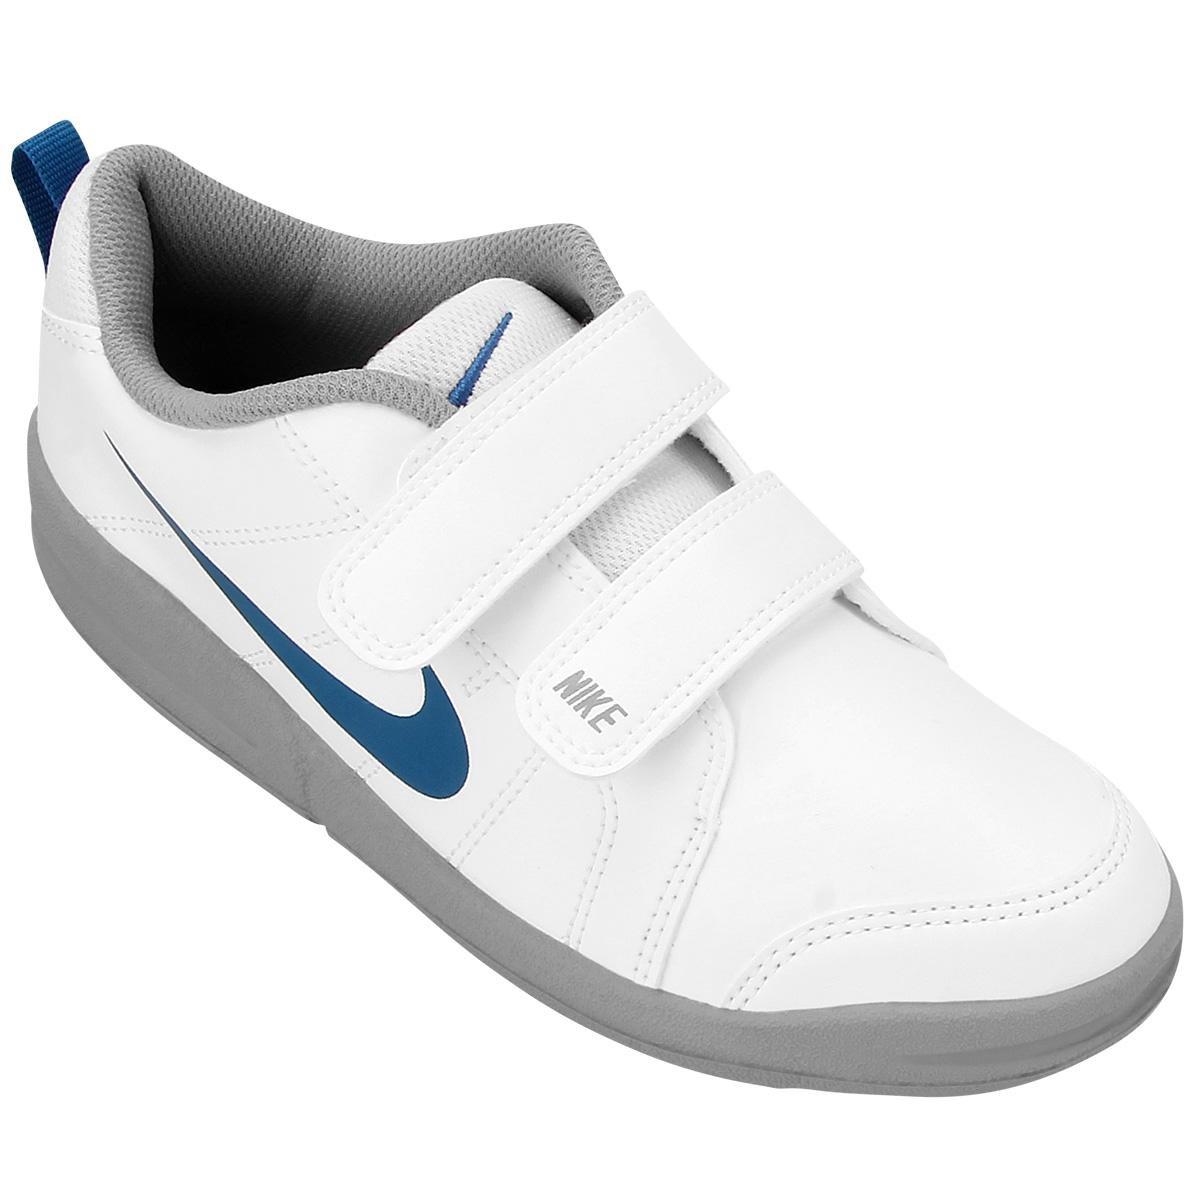 07c5c75908262 Tênis Nike Pico LT PSV Infantil - Compre Agora